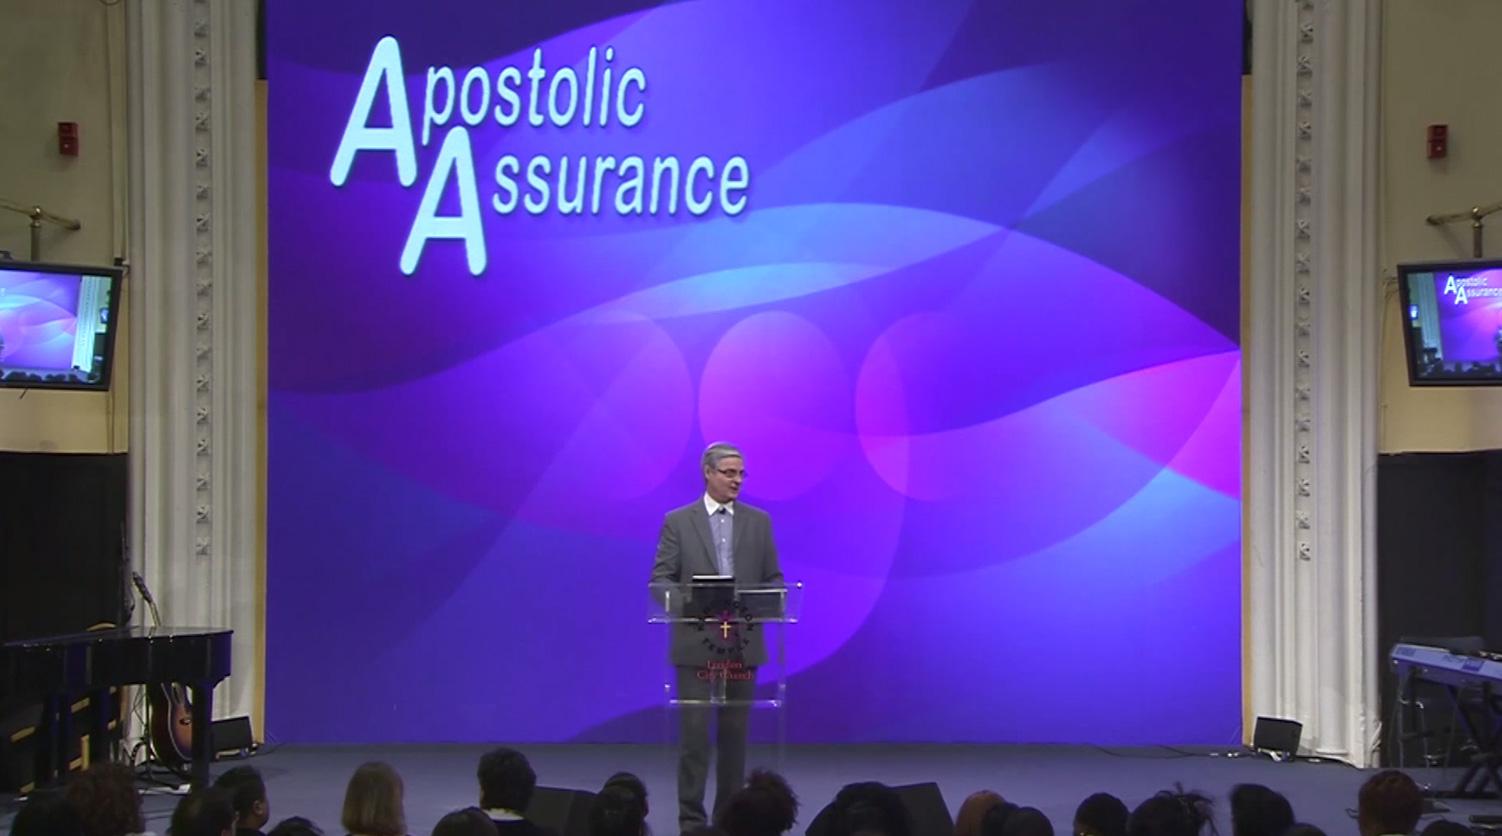 Apostolic Assurance